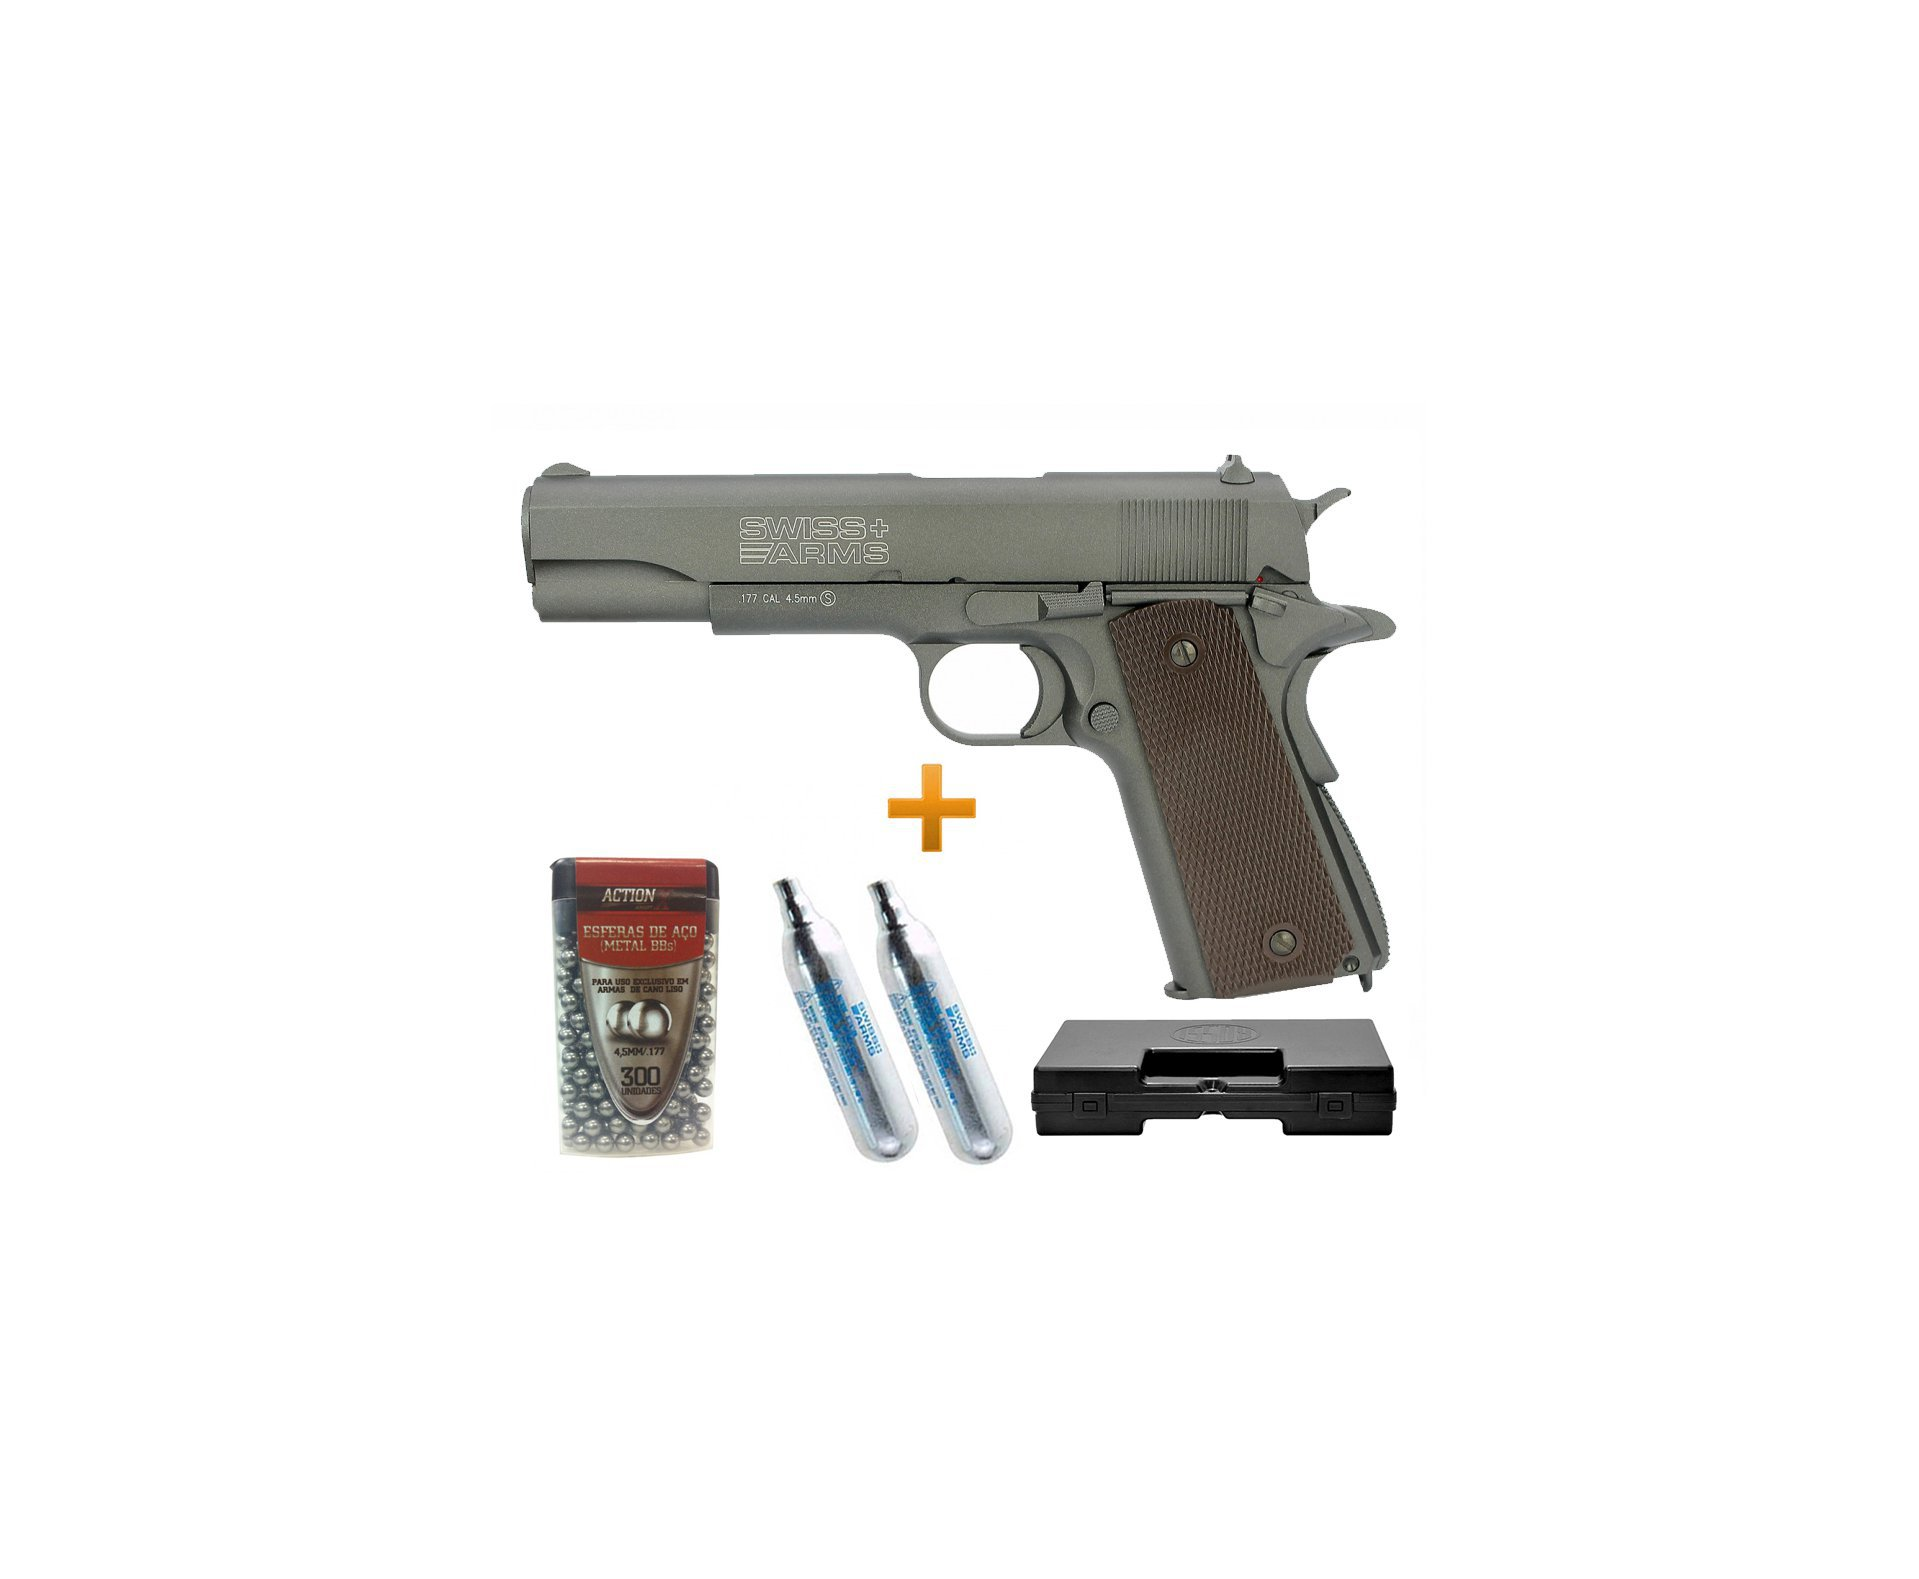 Pistola De Pressão Co2 Sa P1911 Full Metal Blowblack 4.5mm Swiss Arms + Case + Esfera  De Aço + Co2